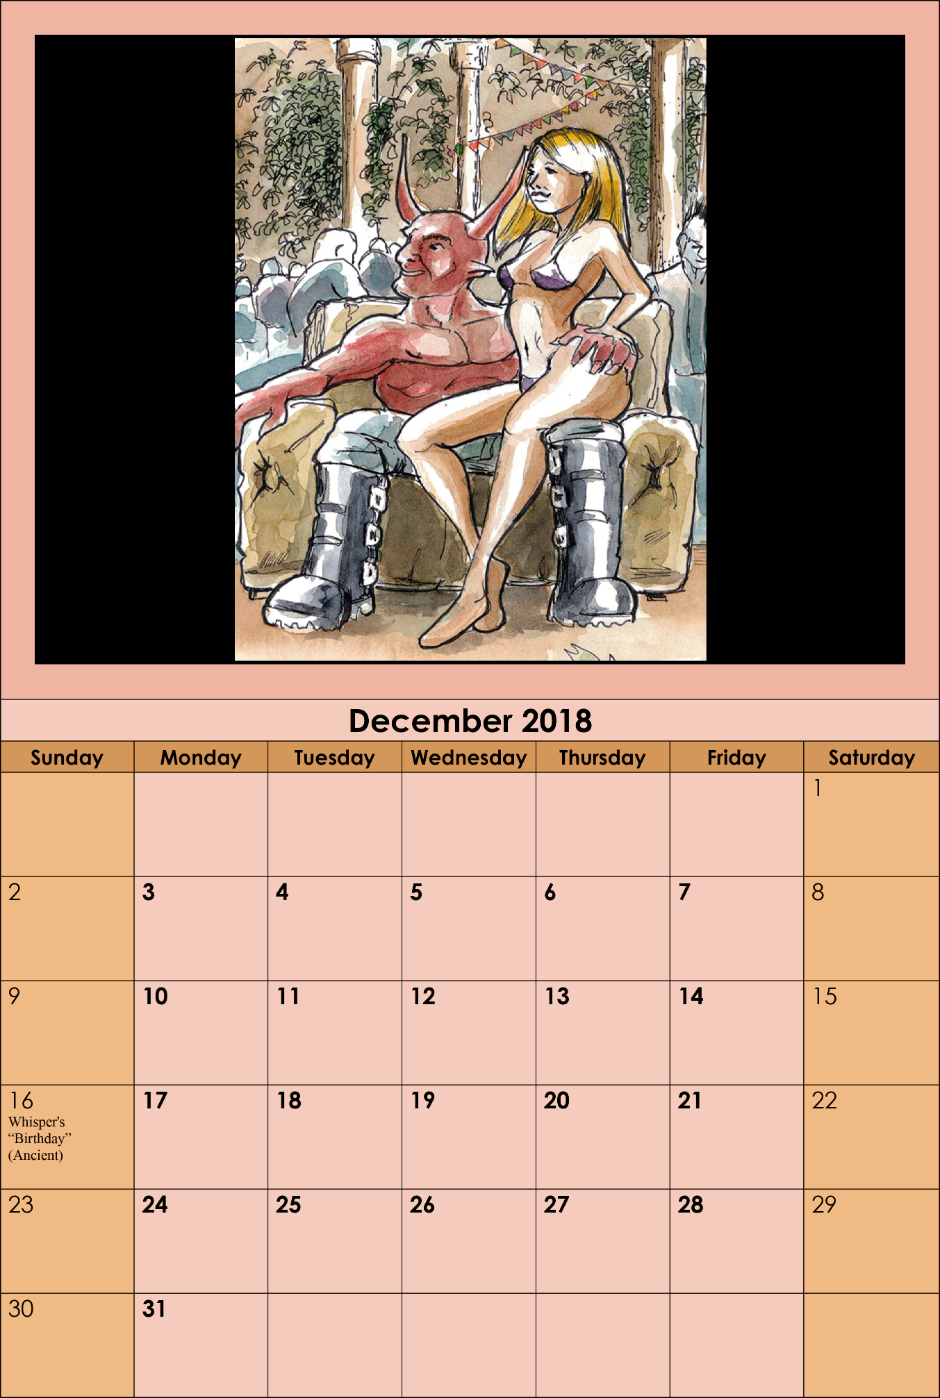 Opidane - December